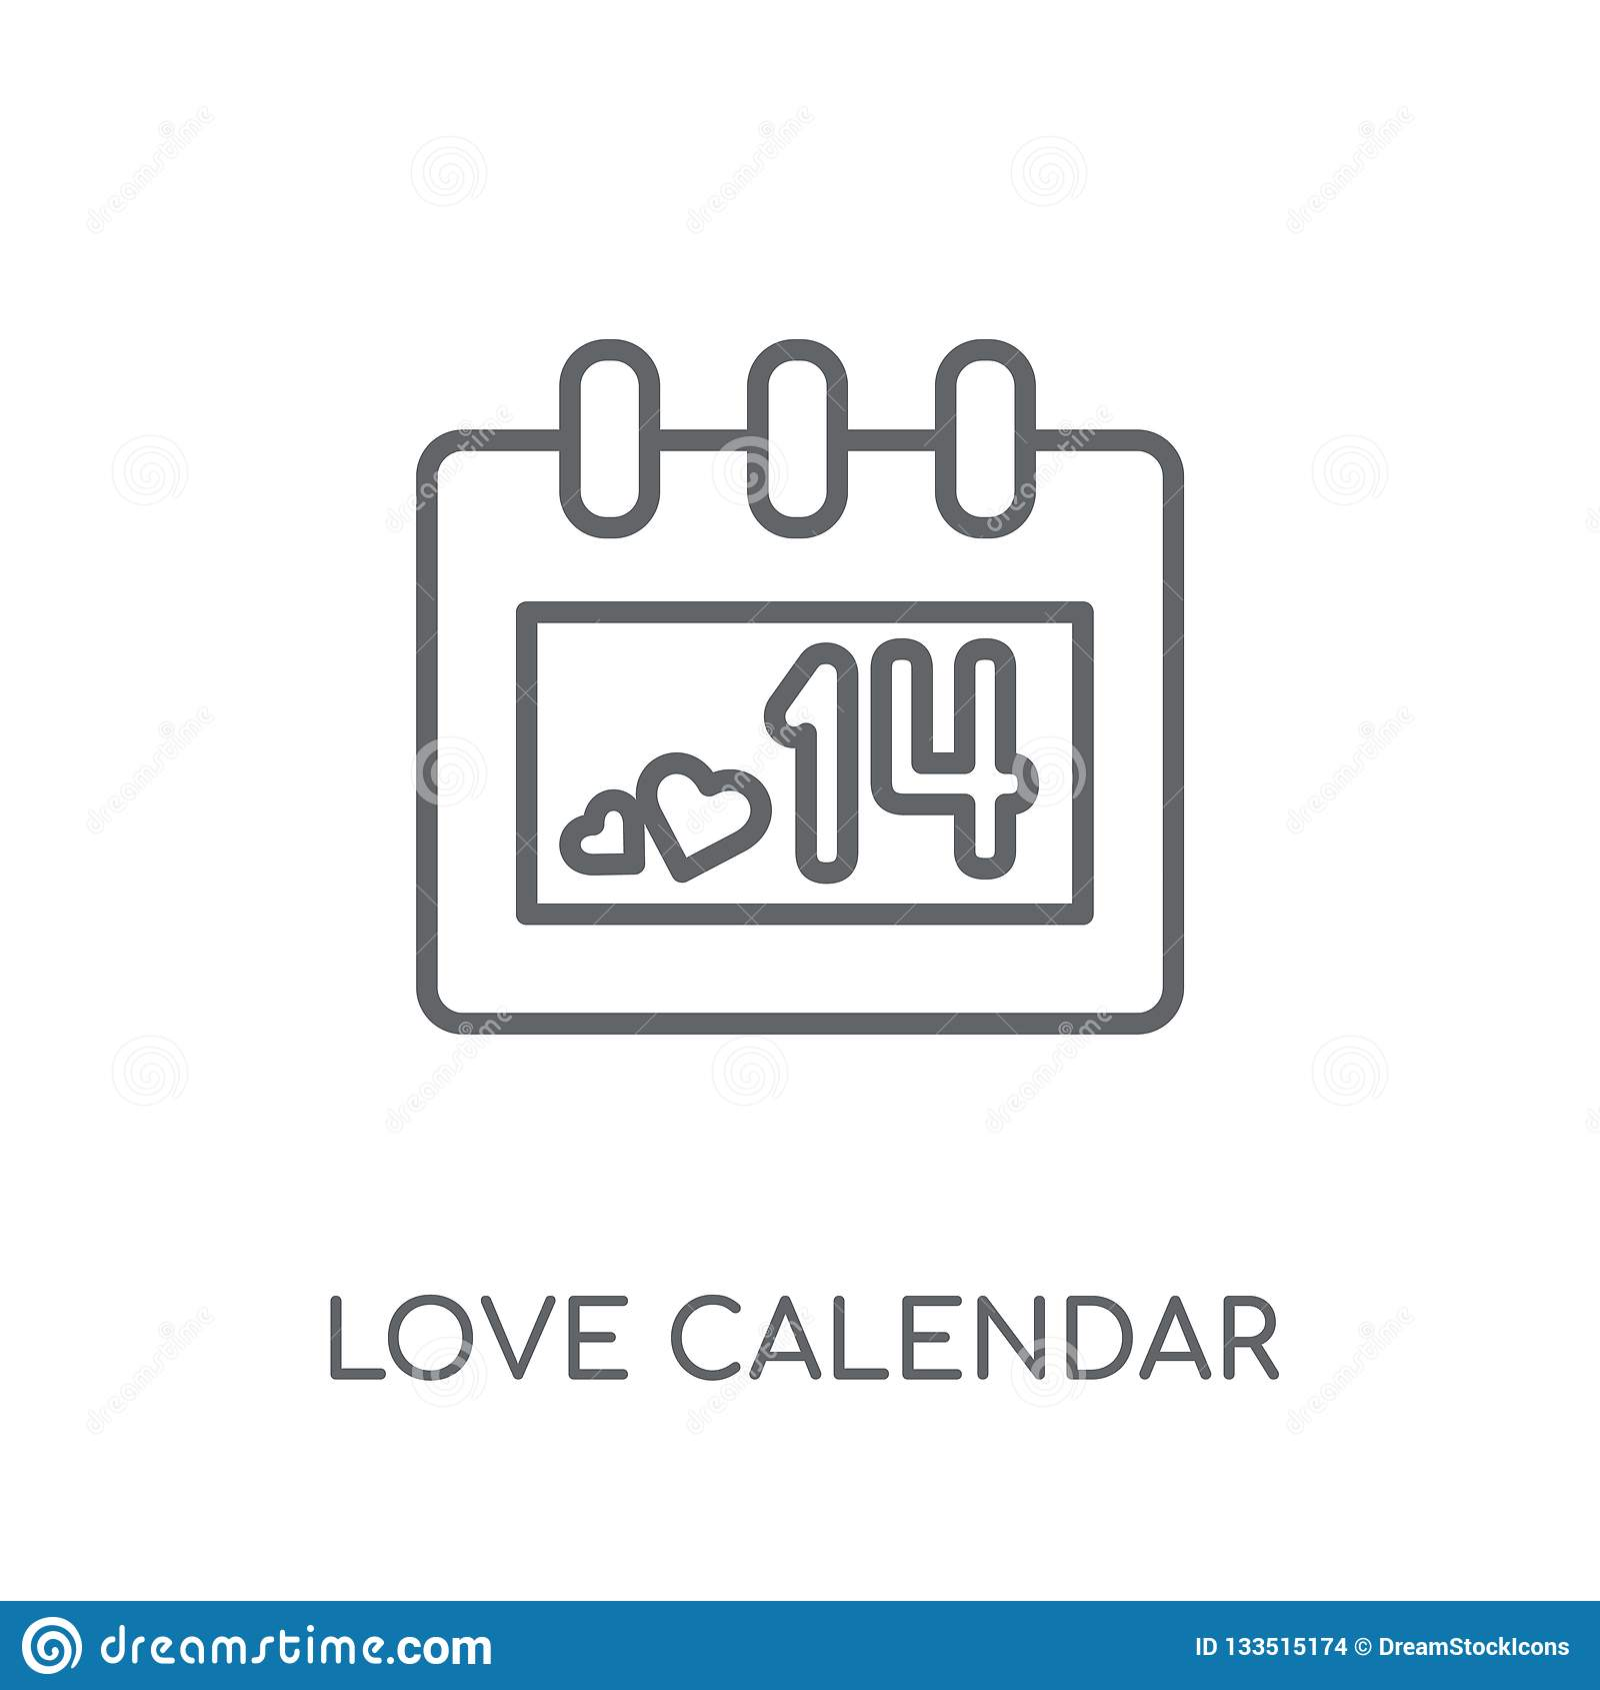 Lineare Ikone Liebe Kalenders Moderner Entwurfsliebe Kalender-Logobetrug